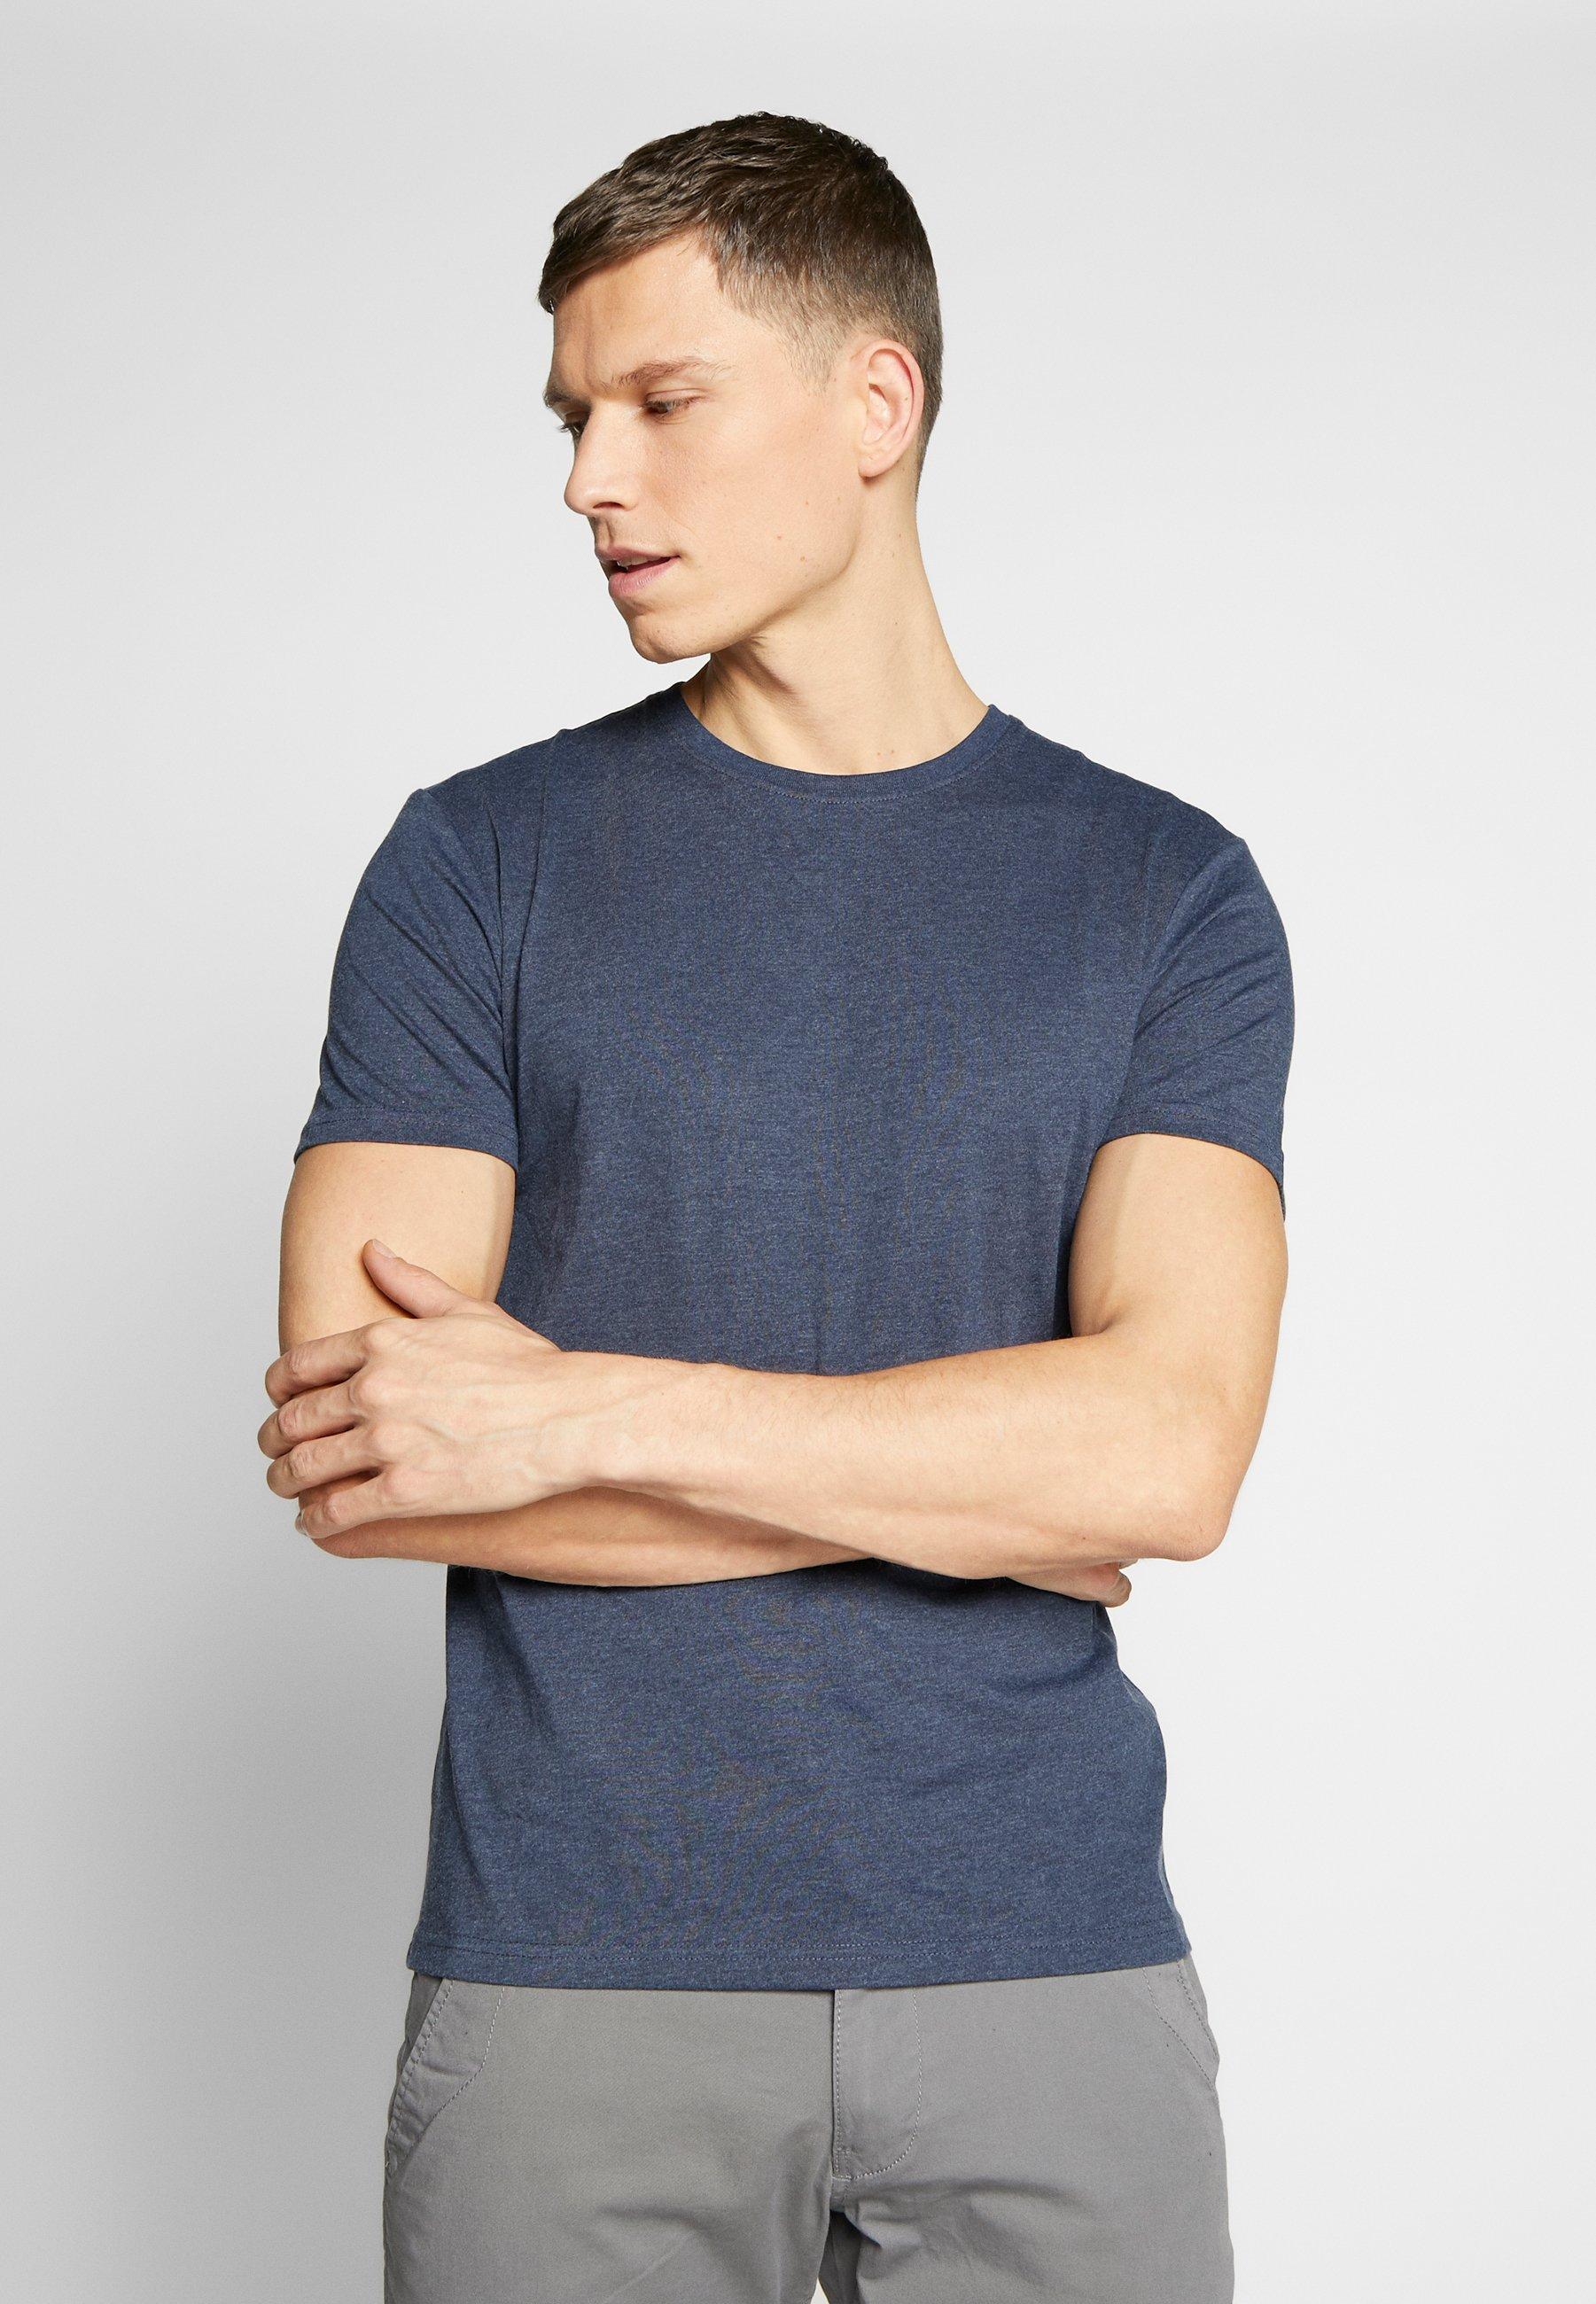 Pier One 3 Pack - T-shirt Basique Mottled Bordeaux/white/blue